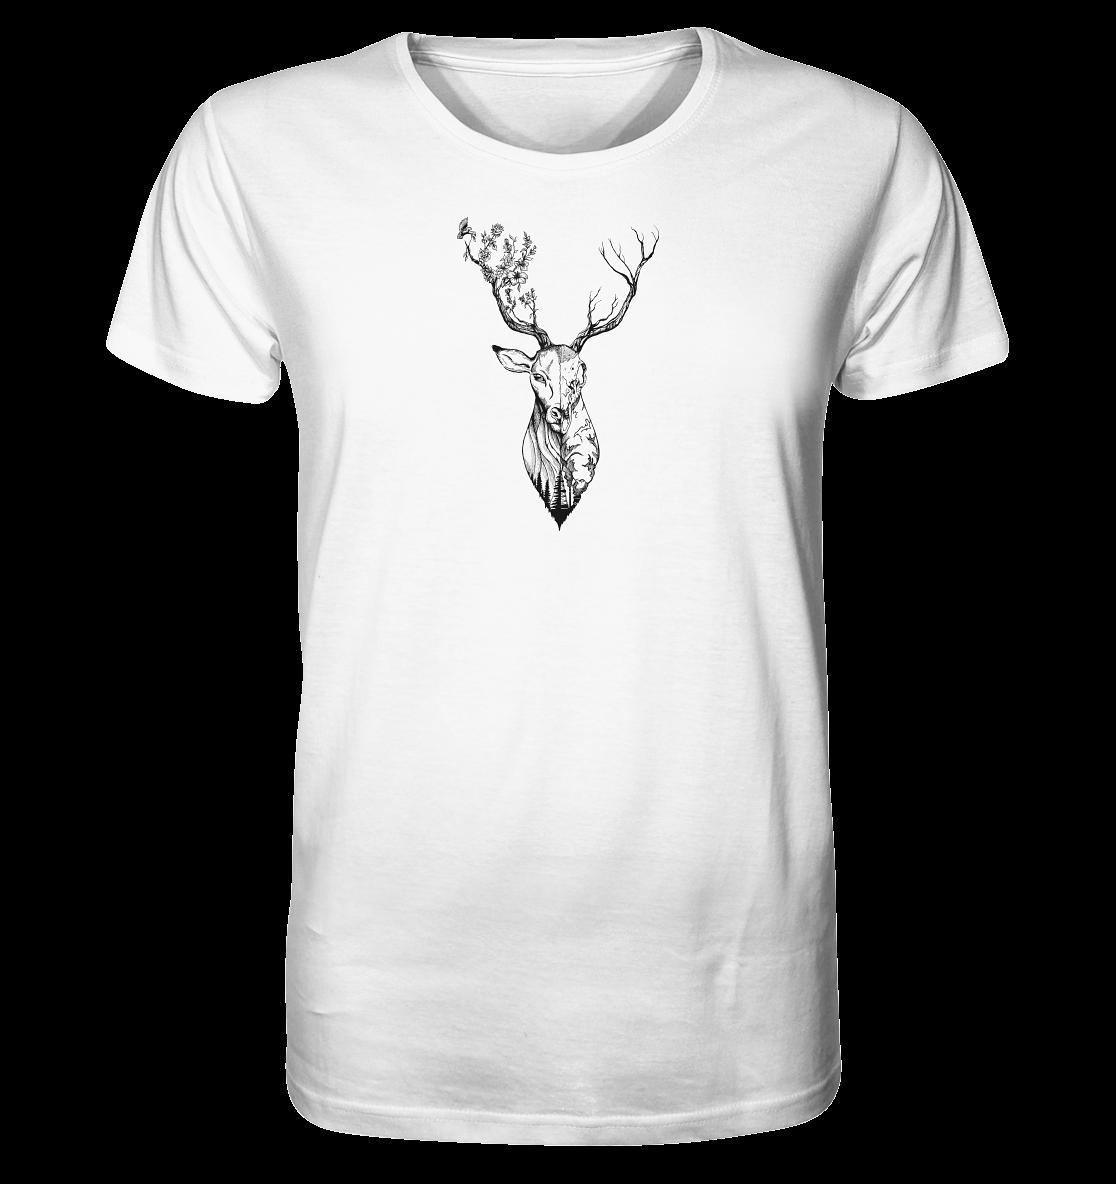 front-organic-shirt-f8f8f8-1116x-8.png